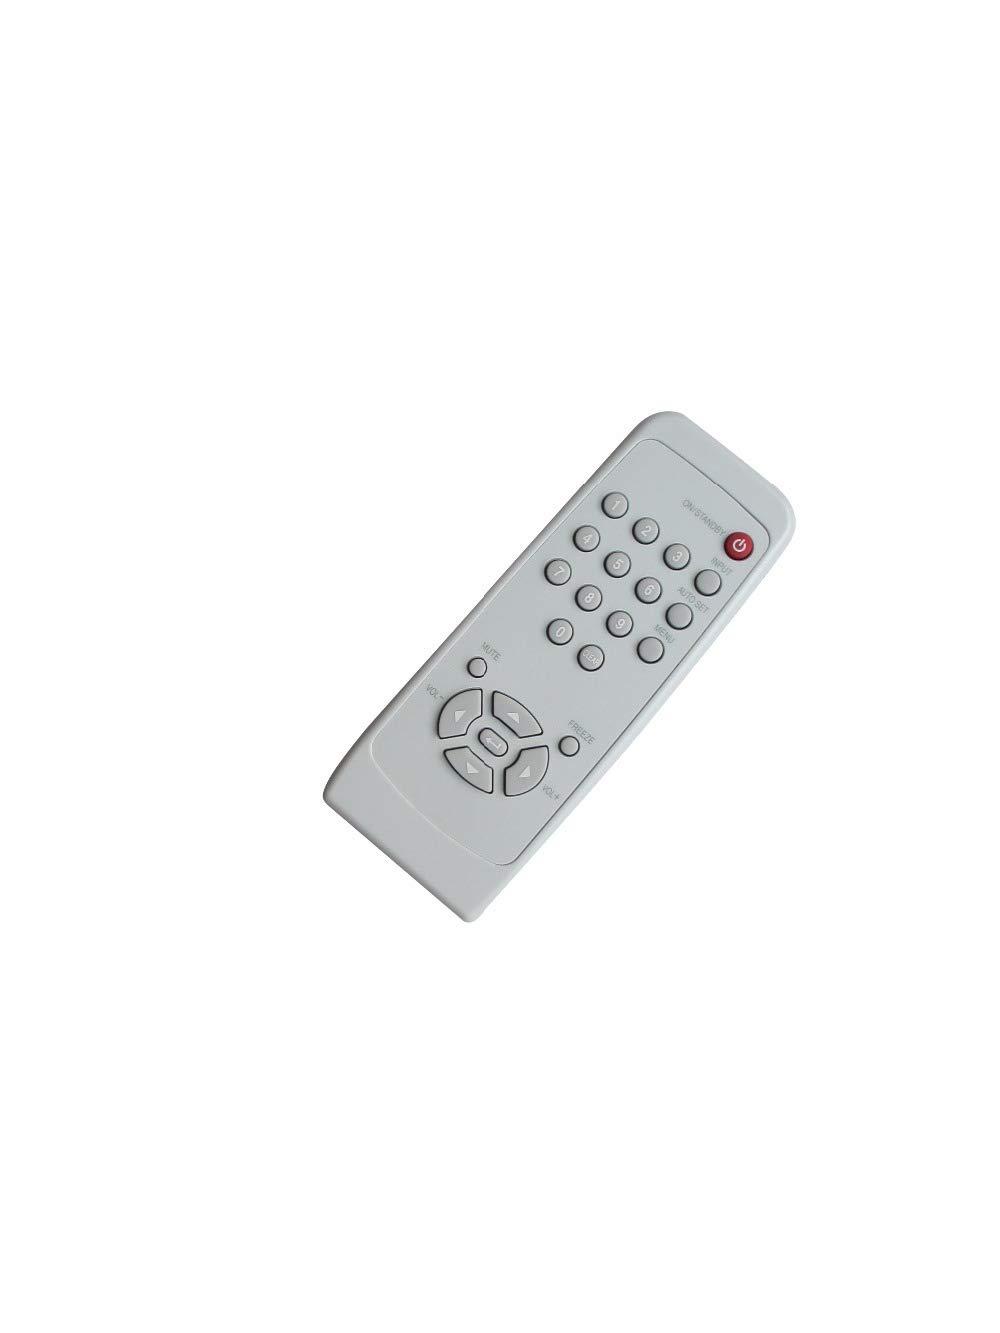 Calvas Remote Control For Toshiba TDP-TW300U TDP-XP2U TDP-TW350U TDP-TW355U TDP-TW420U TDP-TW90AU TDP-TW90U TDP-XP1U 3LCD Projector by GIMAX